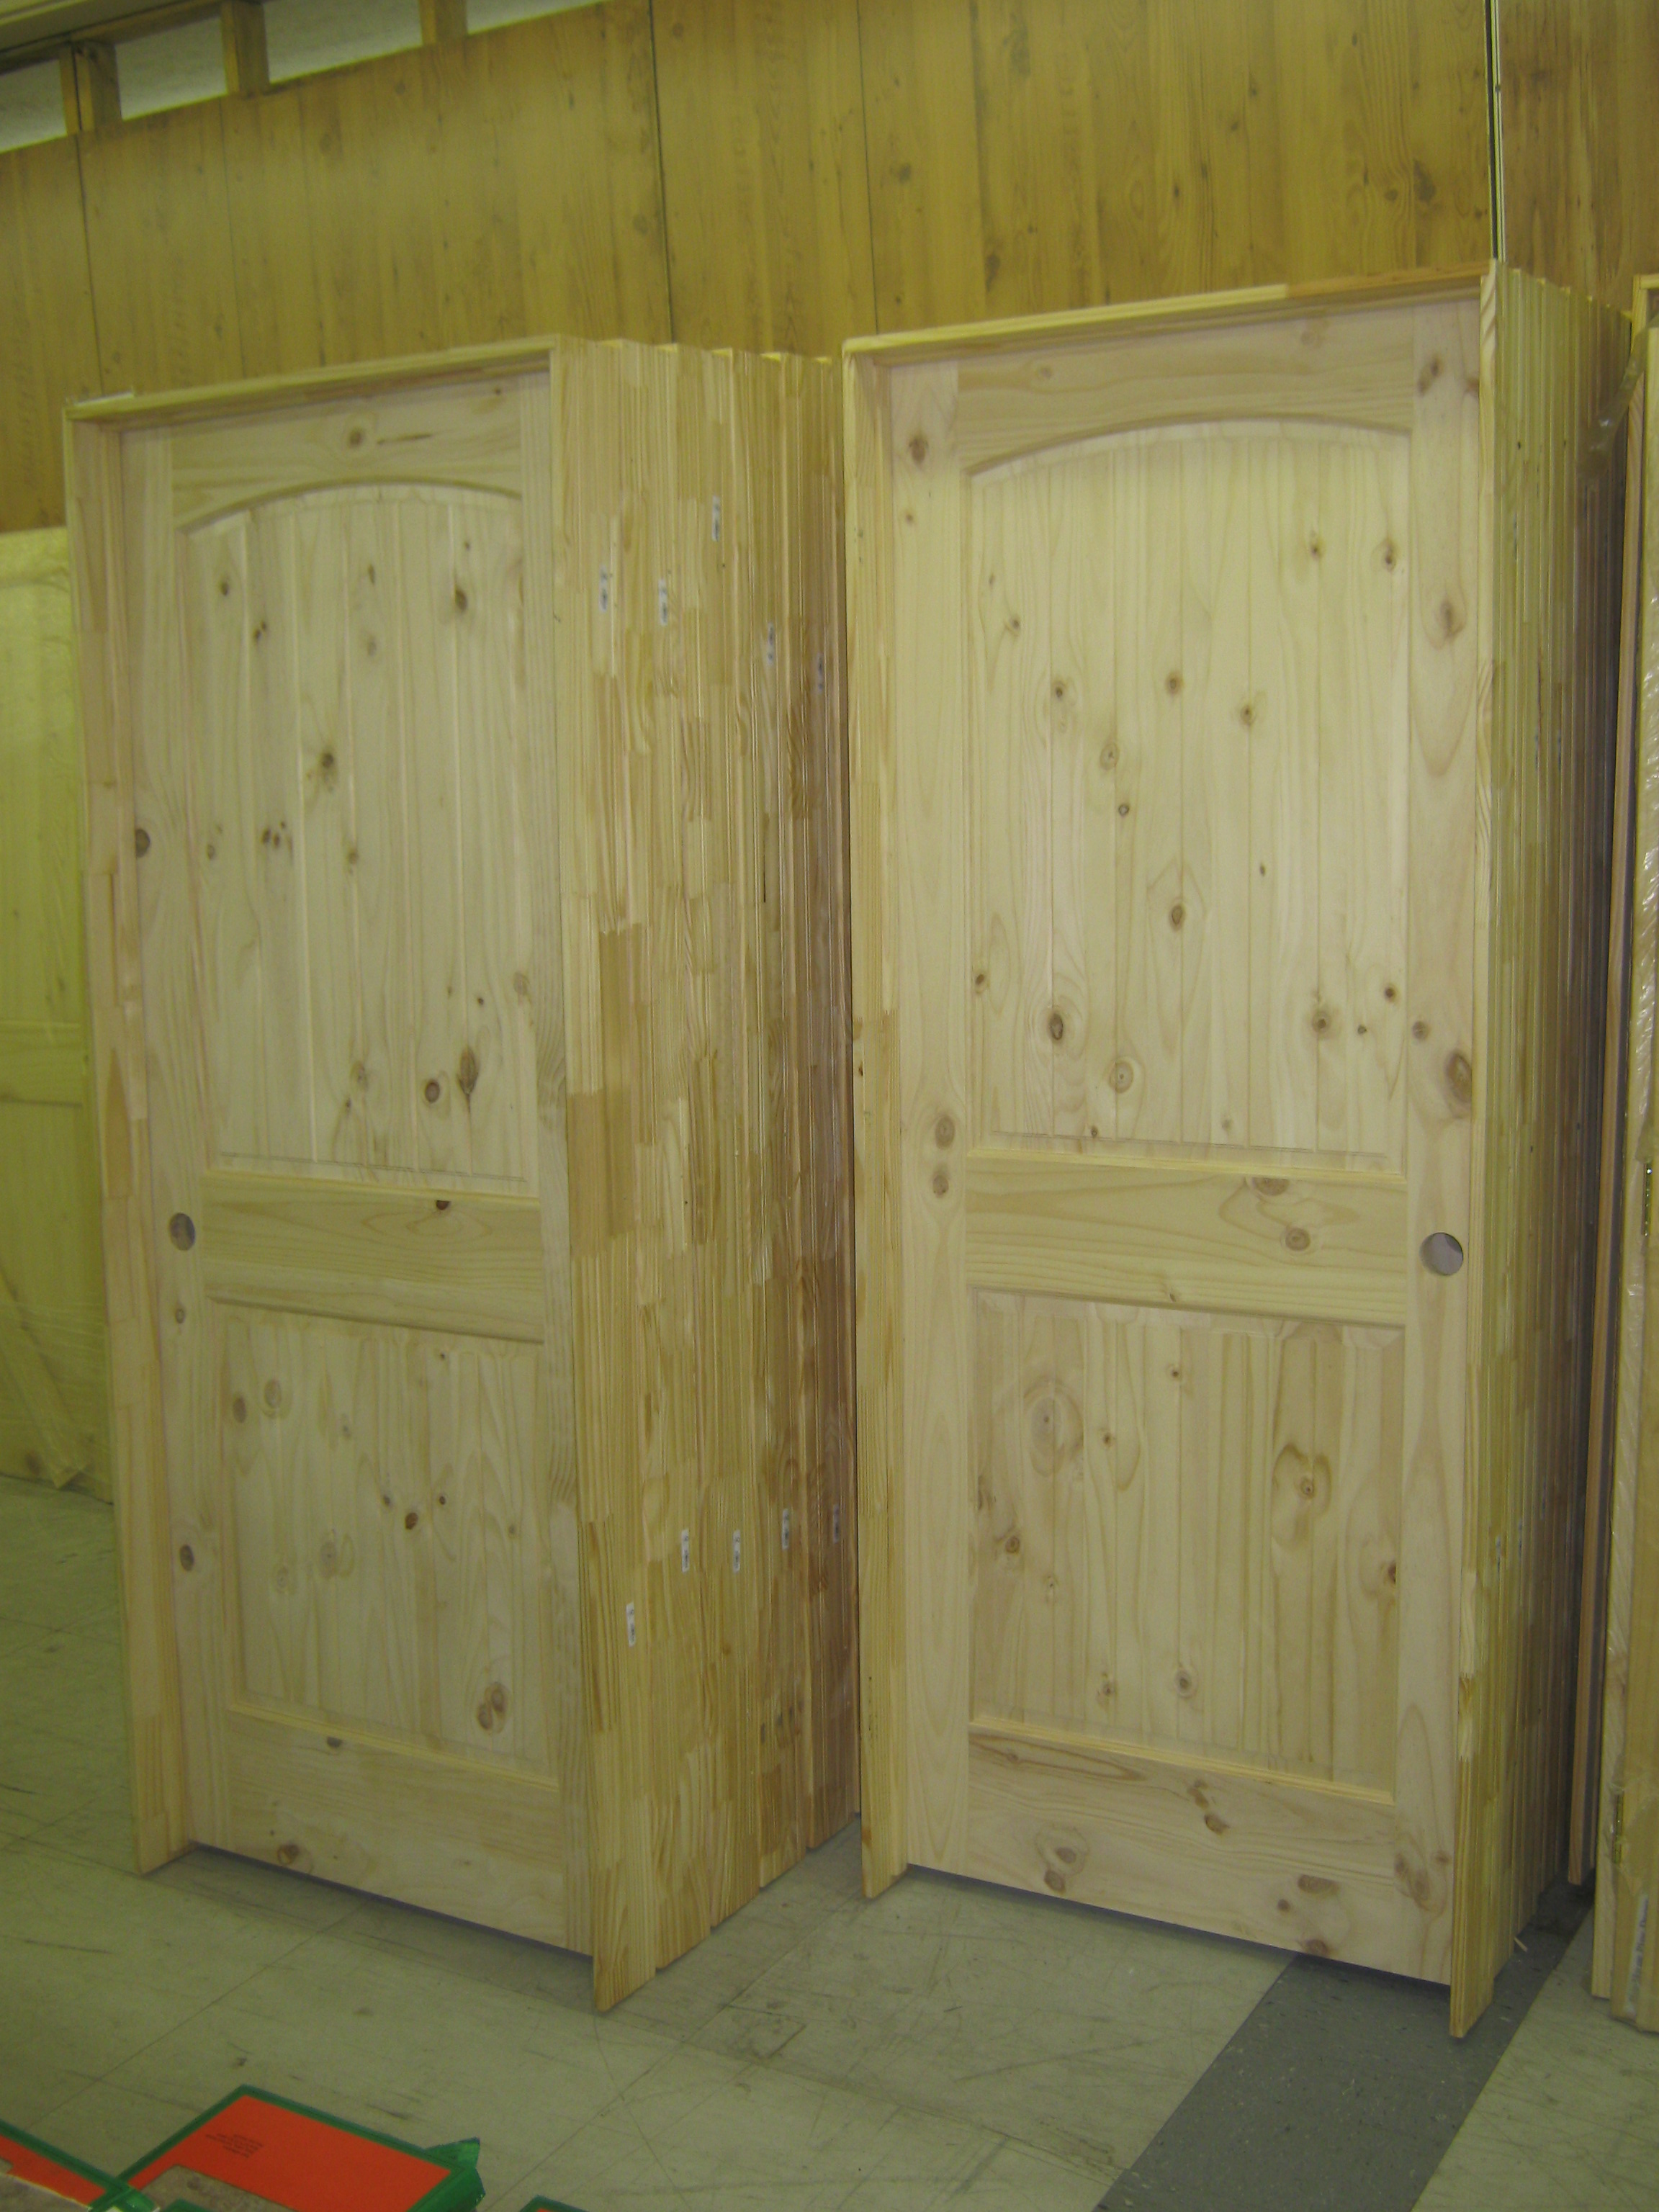 AMISH CUSTOM DOORS KNOTTY PINE INTERIOR PREHUNG DOORS